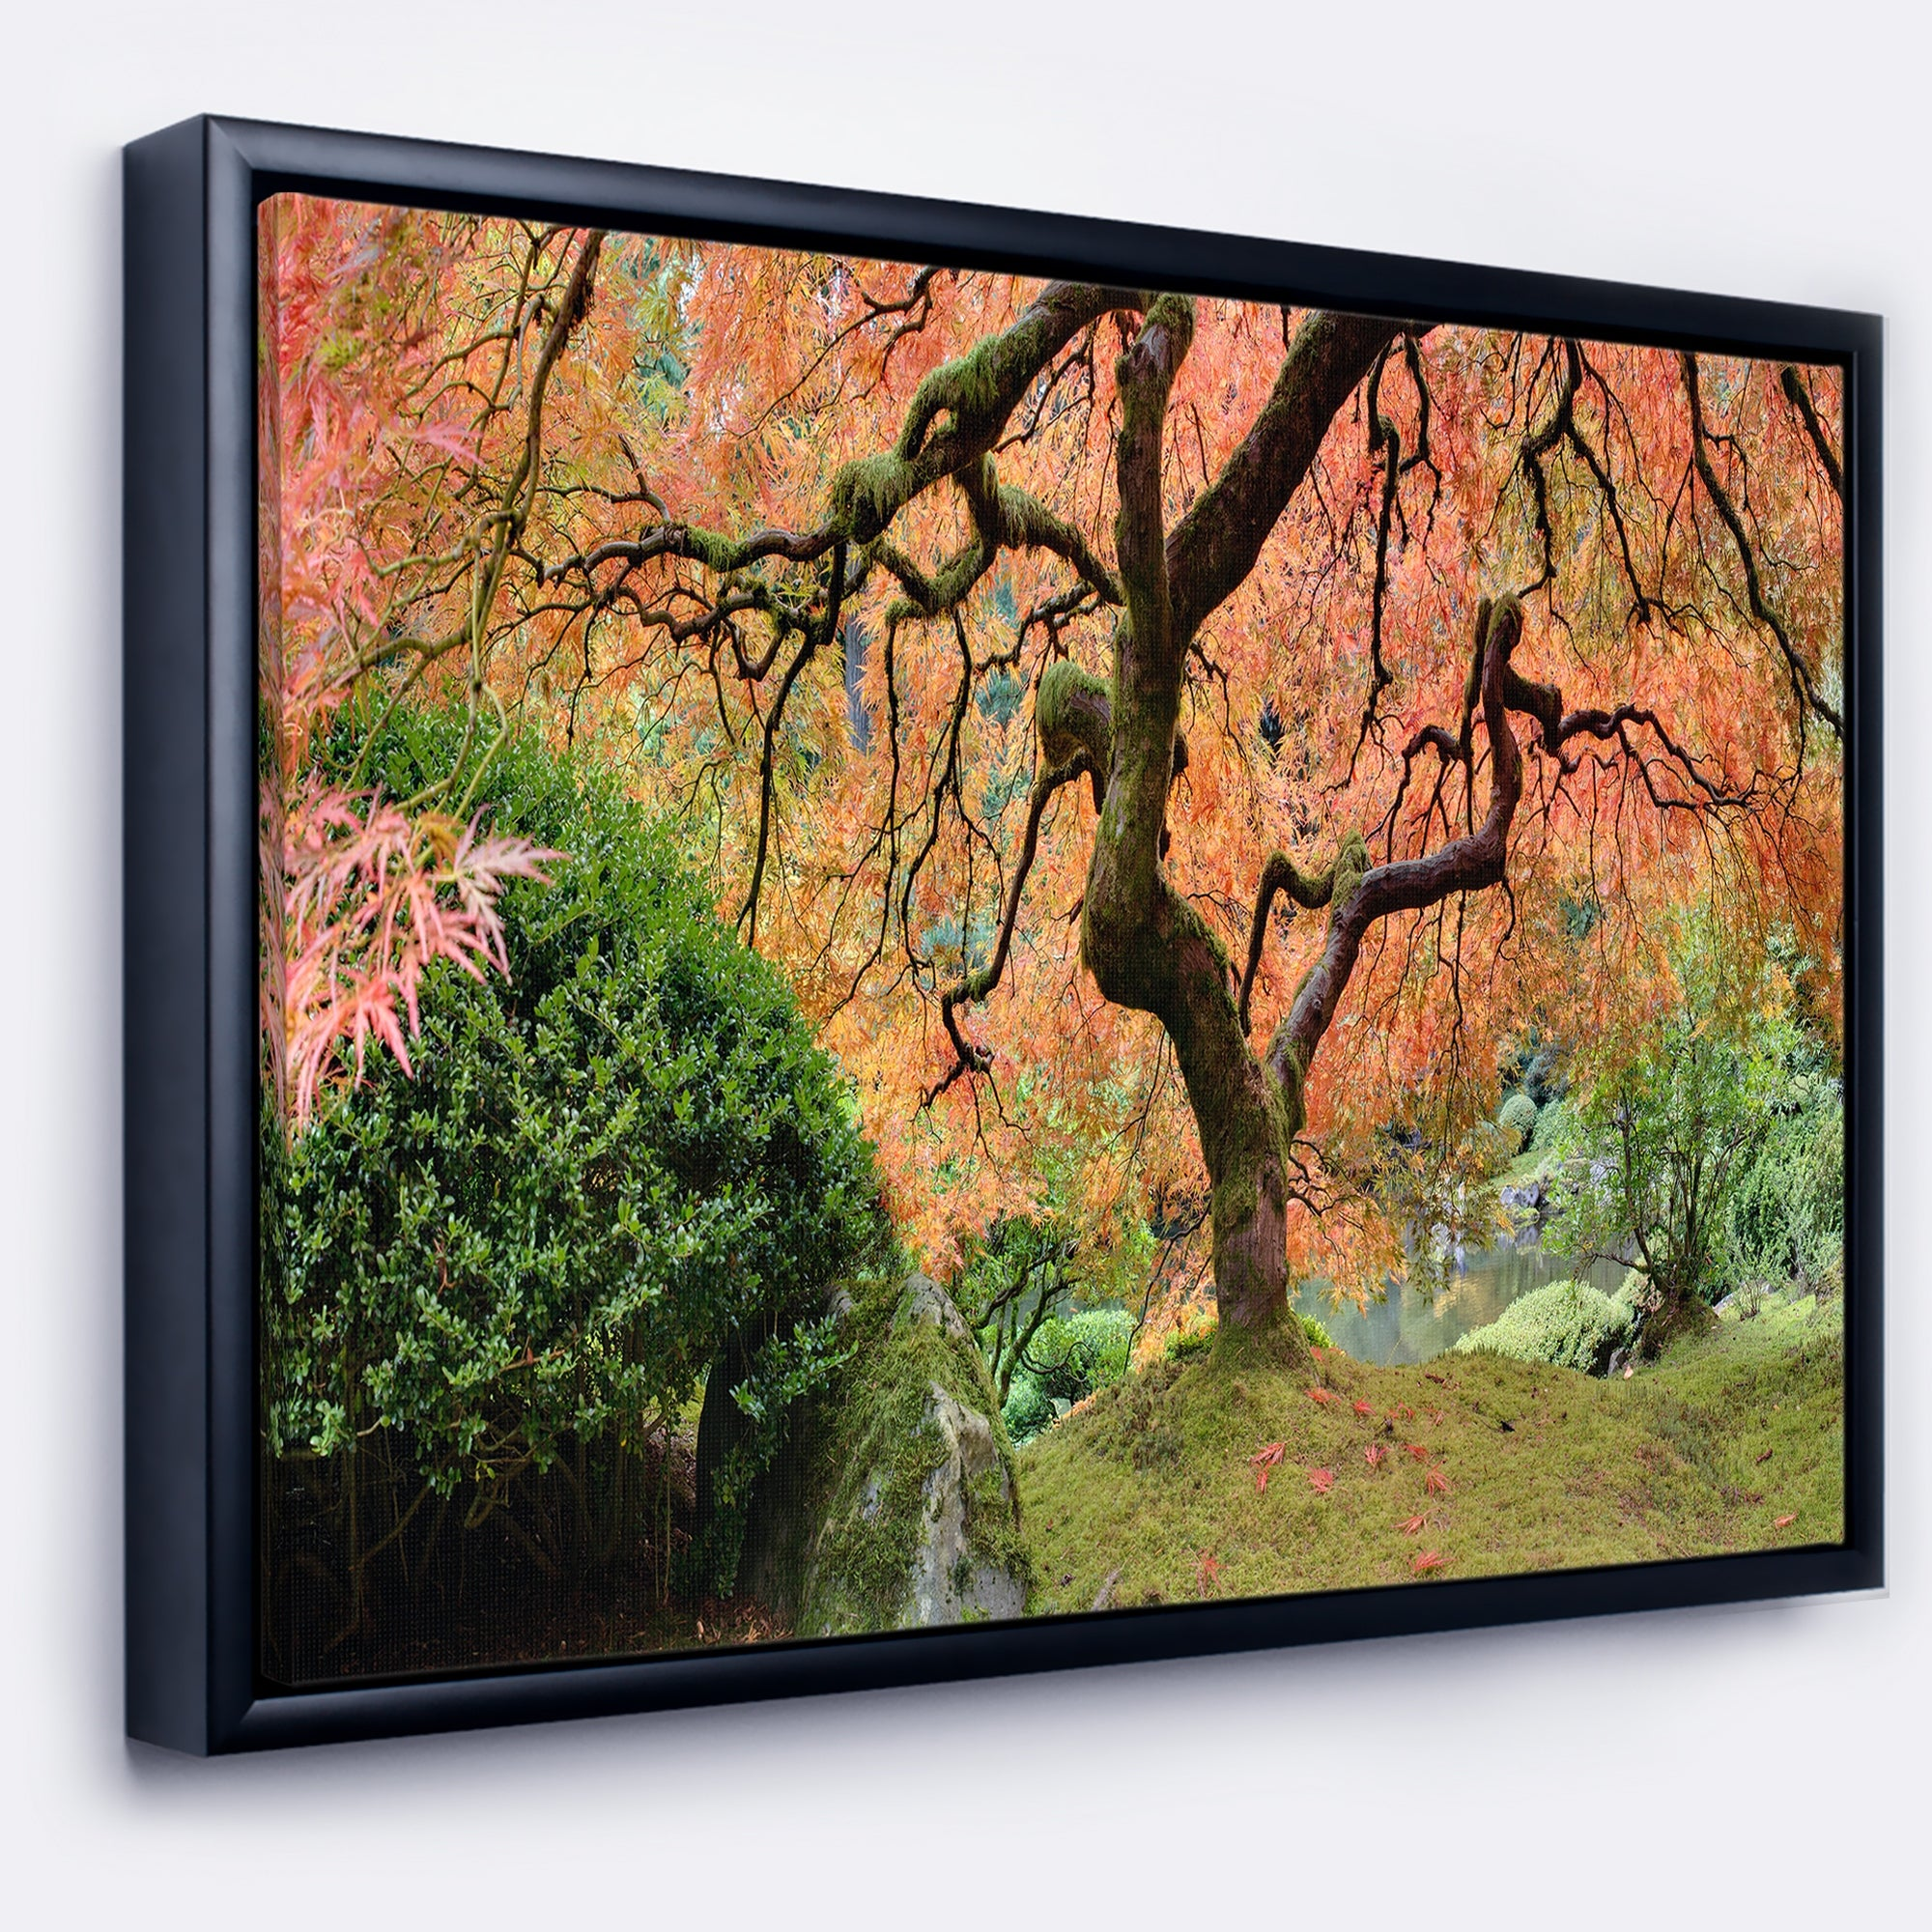 Designart Old Japanese Maple Tree Landscape Photography Framed Canvas Art Print Overstock 18951698